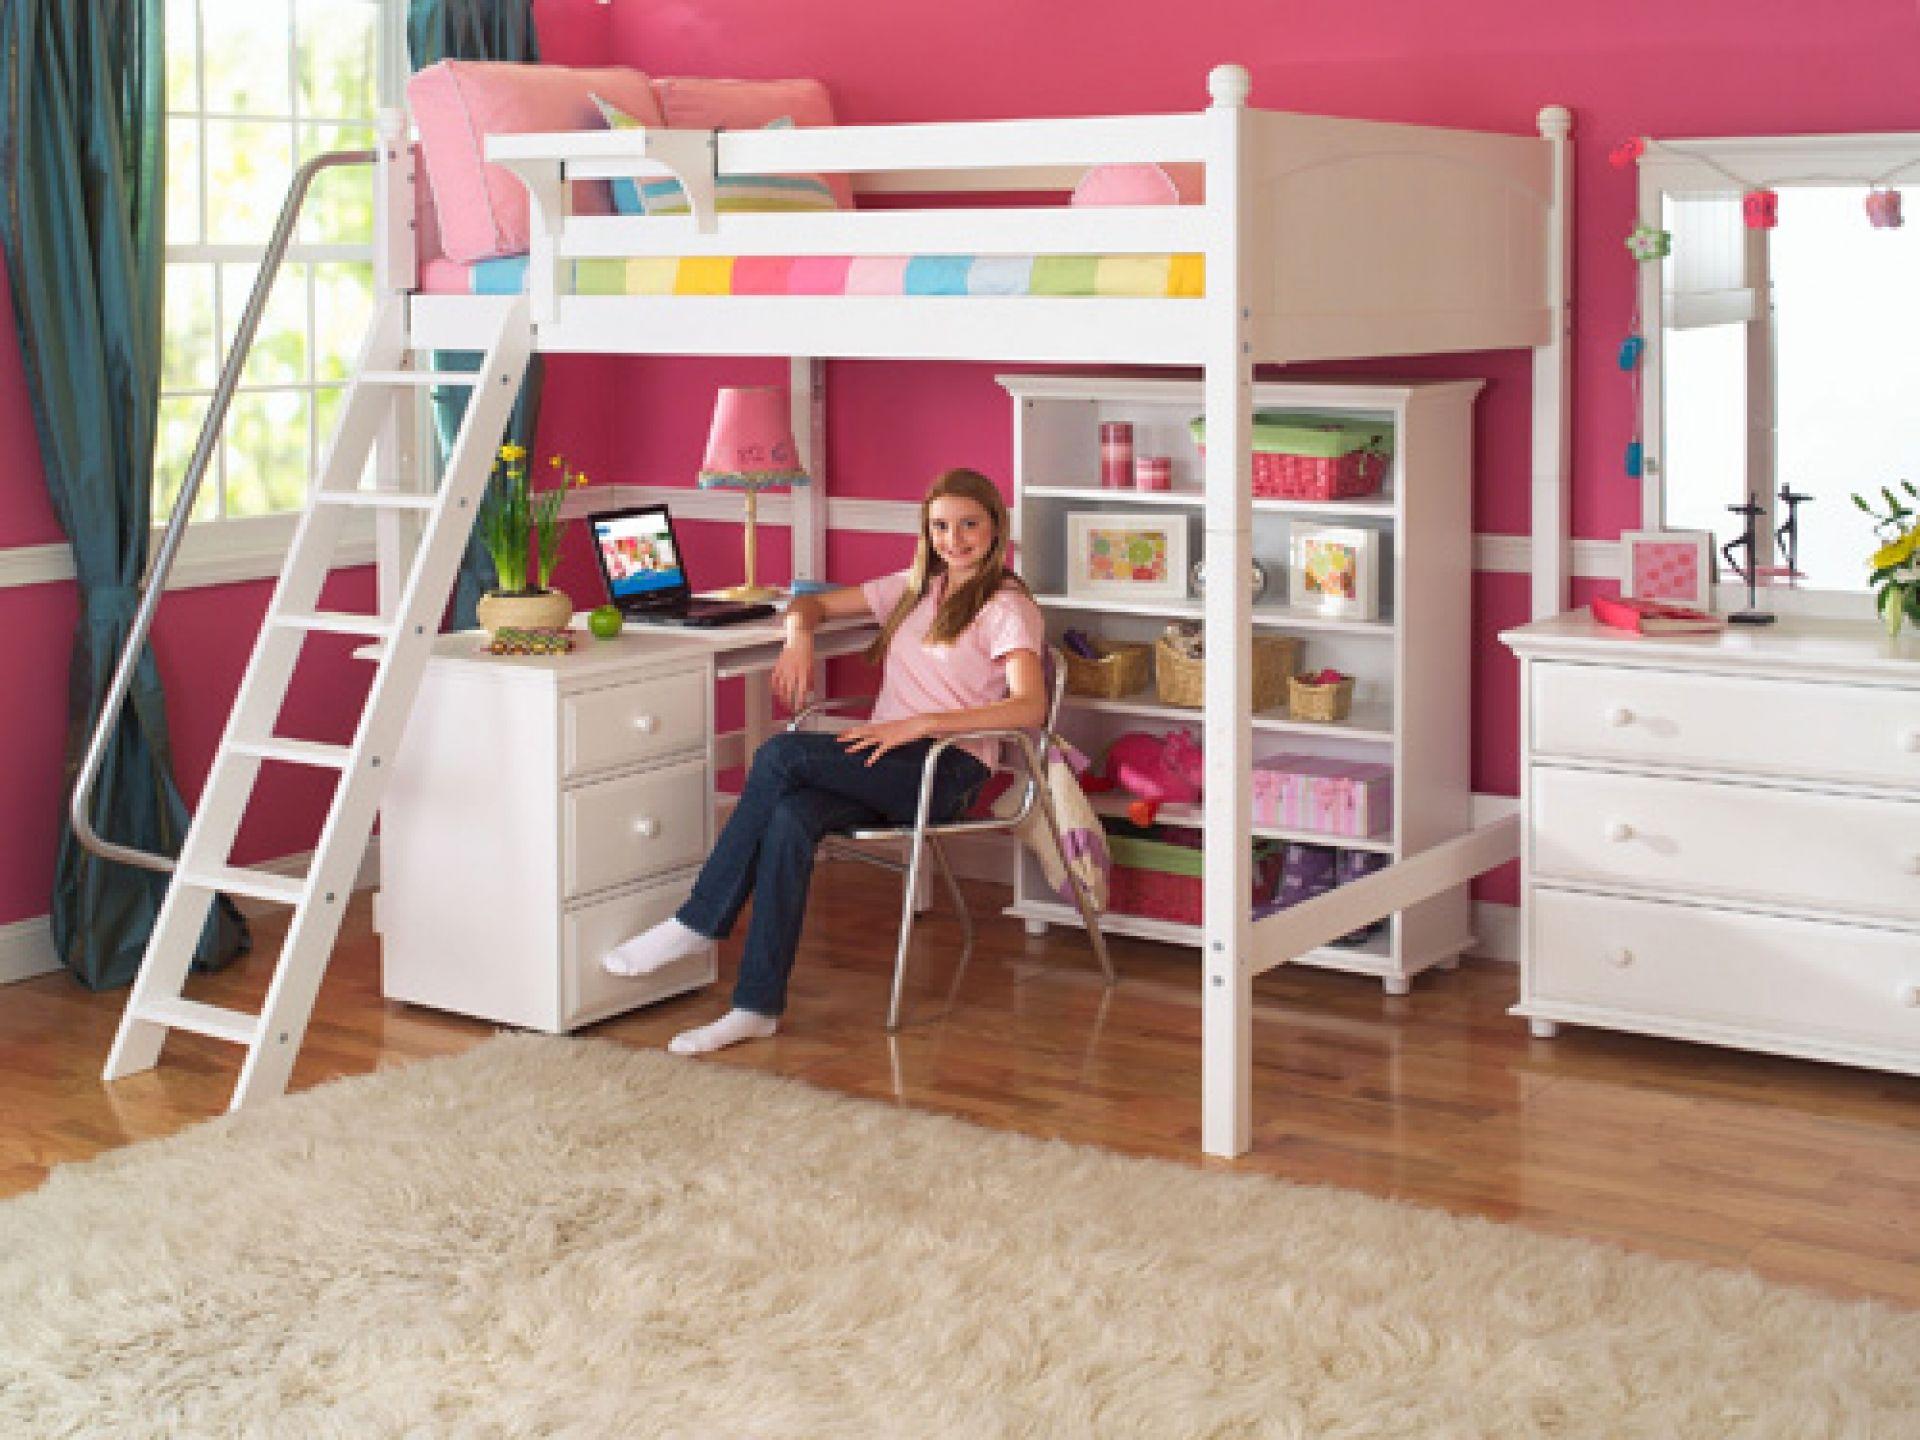 Teenage loft bedroom designs  Best Loft Beds for Teenage Girls  katrinahousingbest